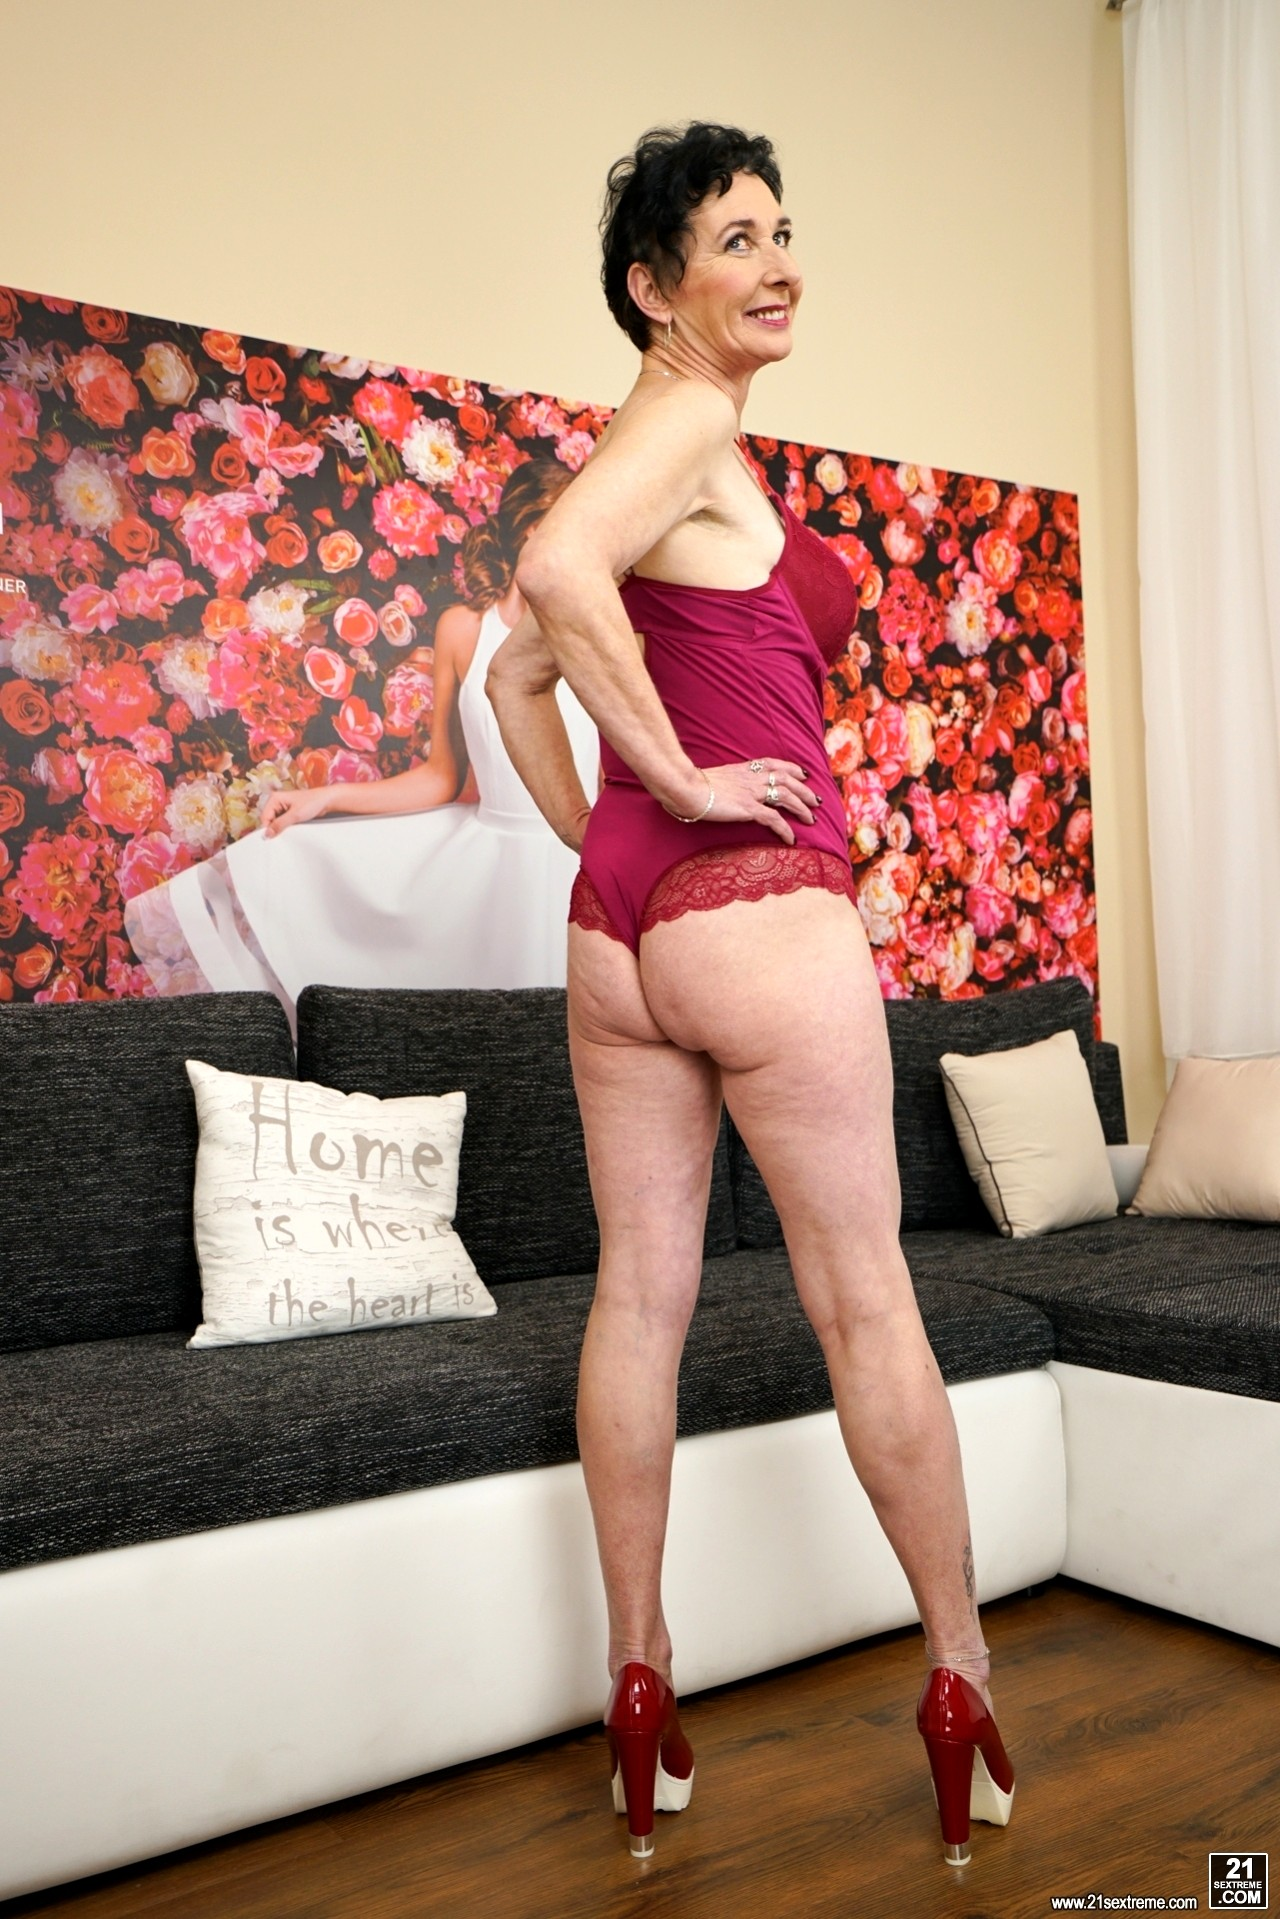 Babe Today 21 Sextury Pixie Top Secret Granny Webcam Porn Pics-9898